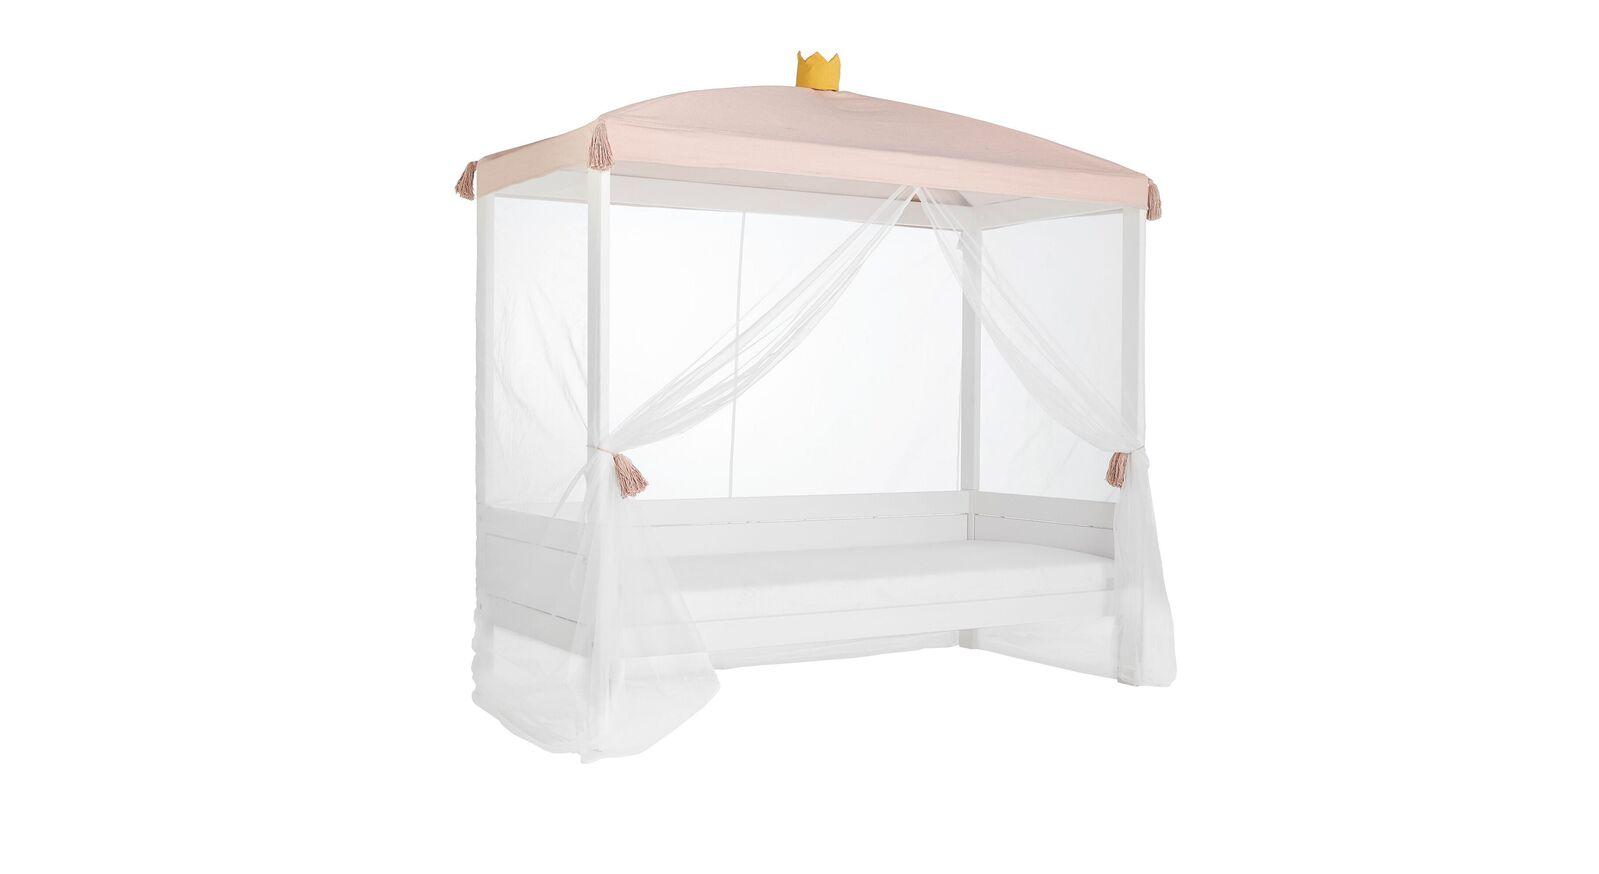 LIFETIME Kinder-Himmelbett Princess mit rosafarbenem Dach